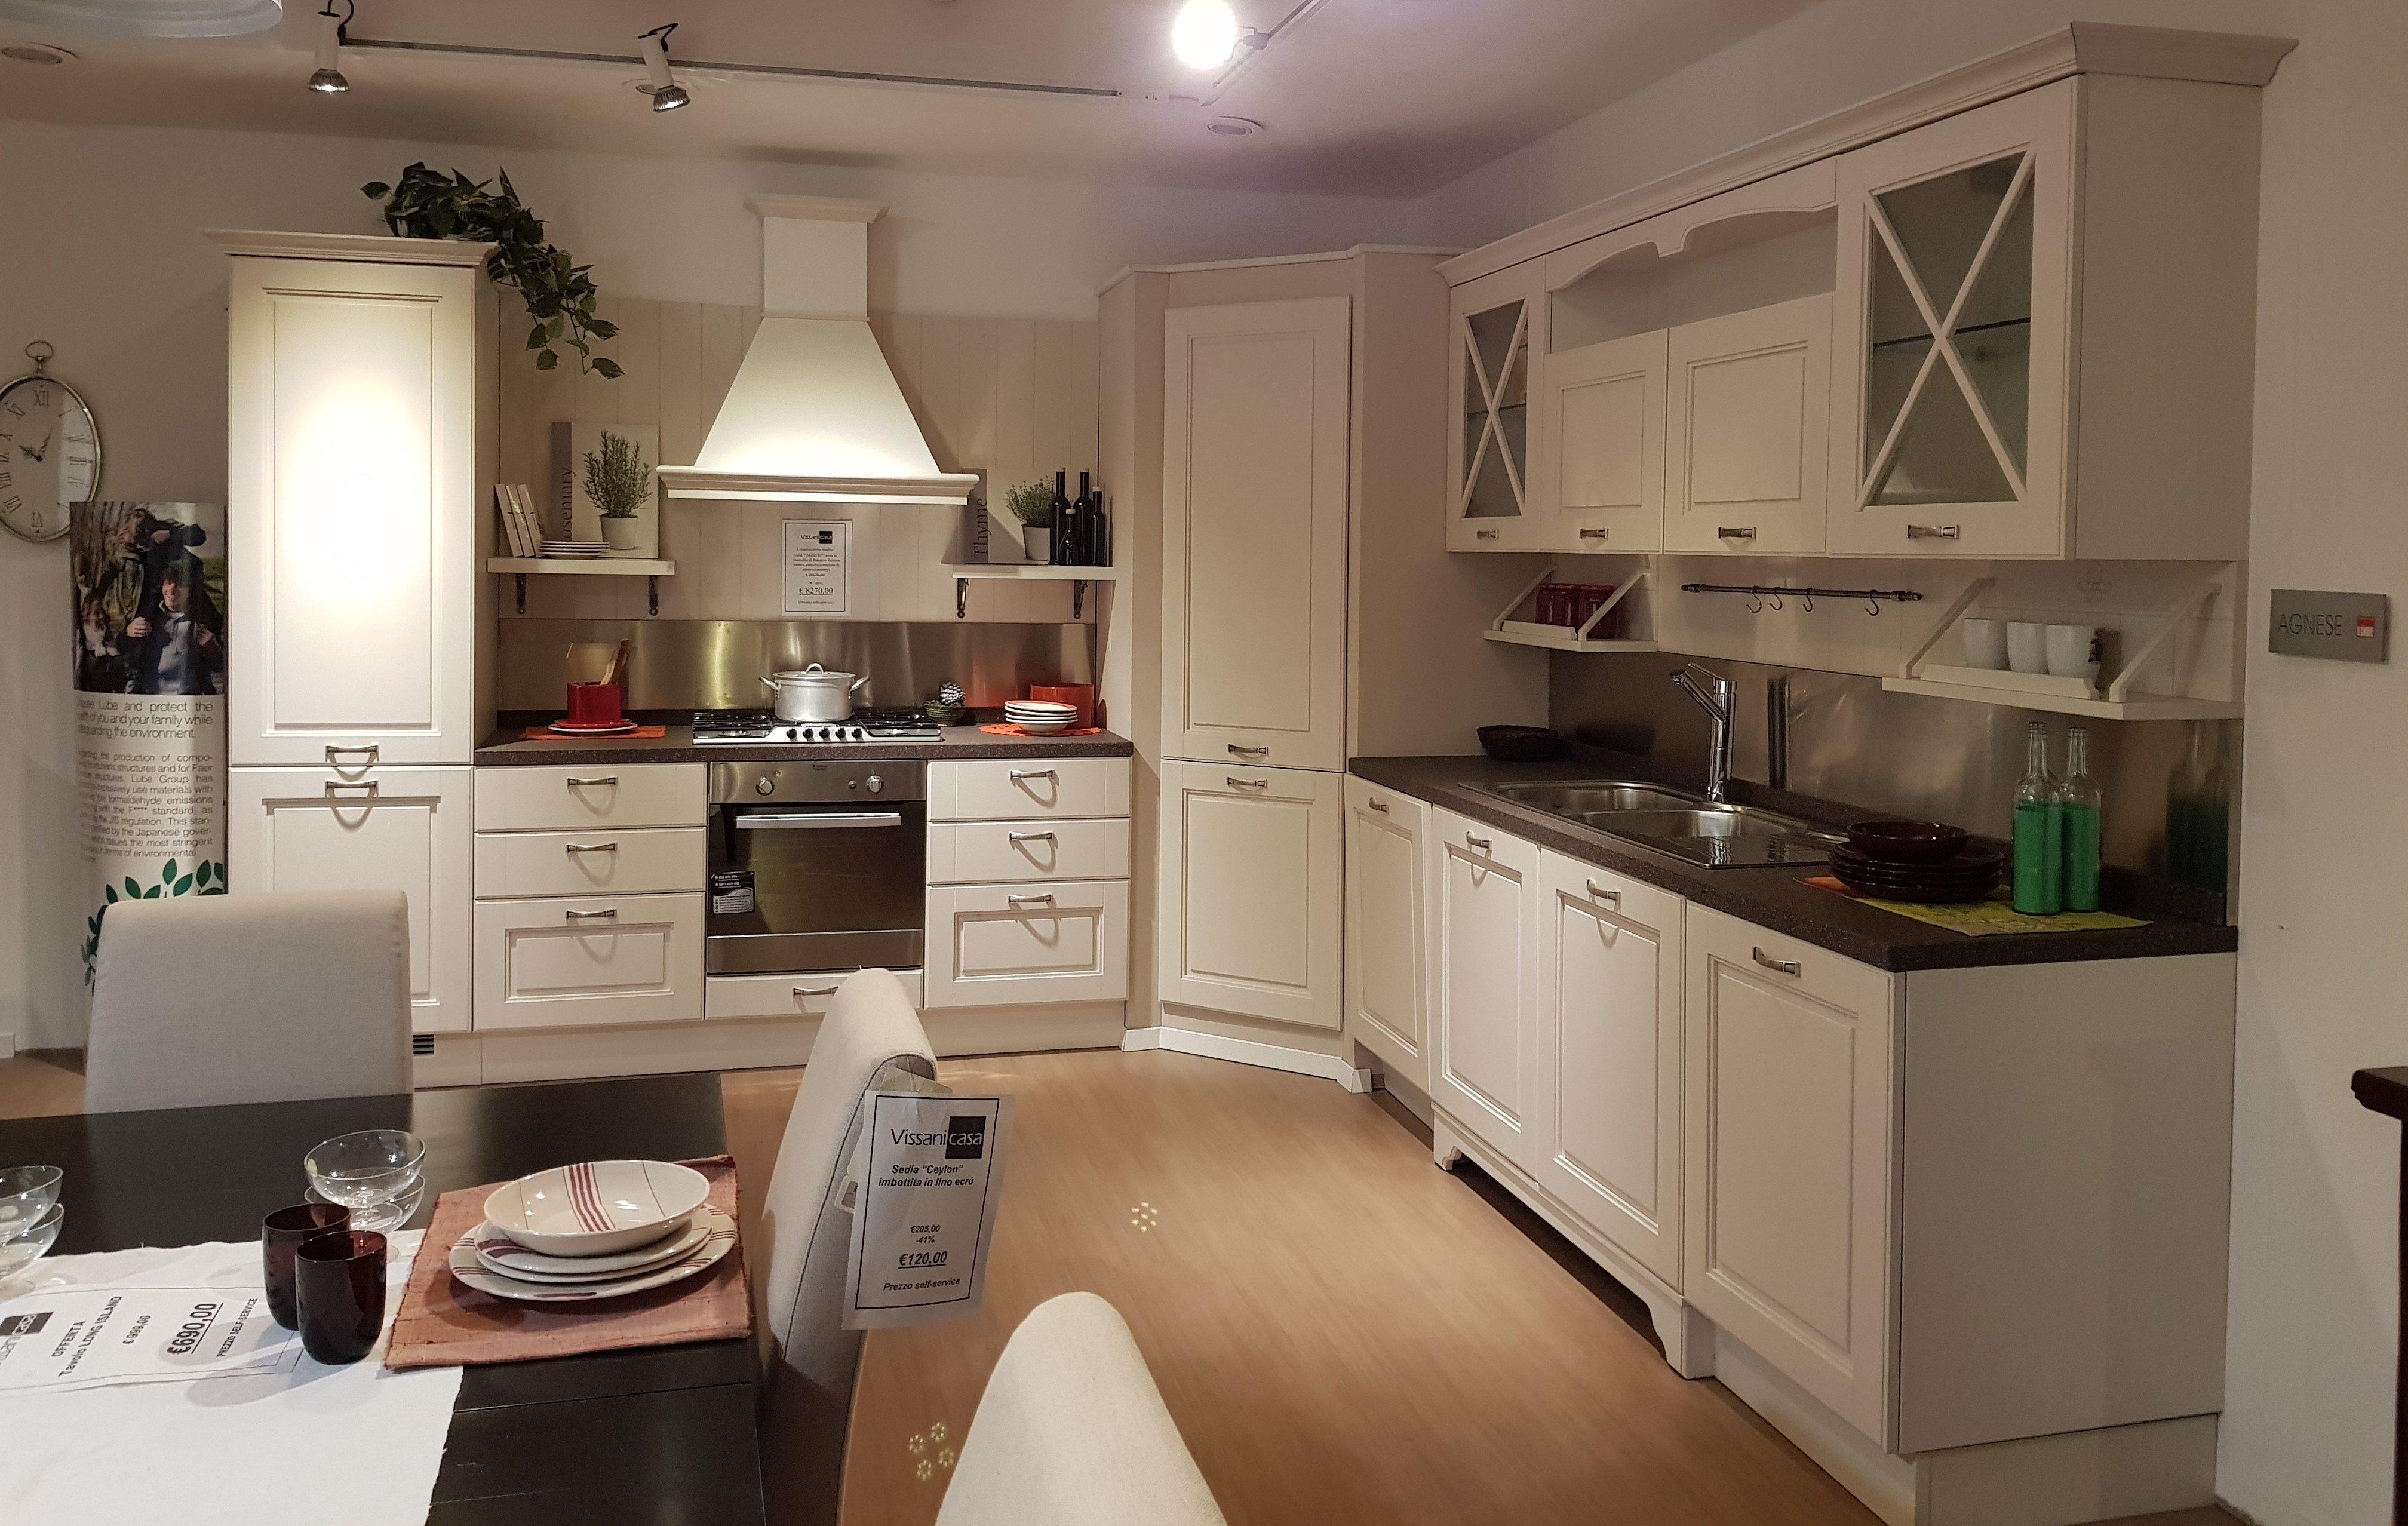 Offerte Cucine Componibili Lube.Cucina Lube Agnese Bianco Camelia